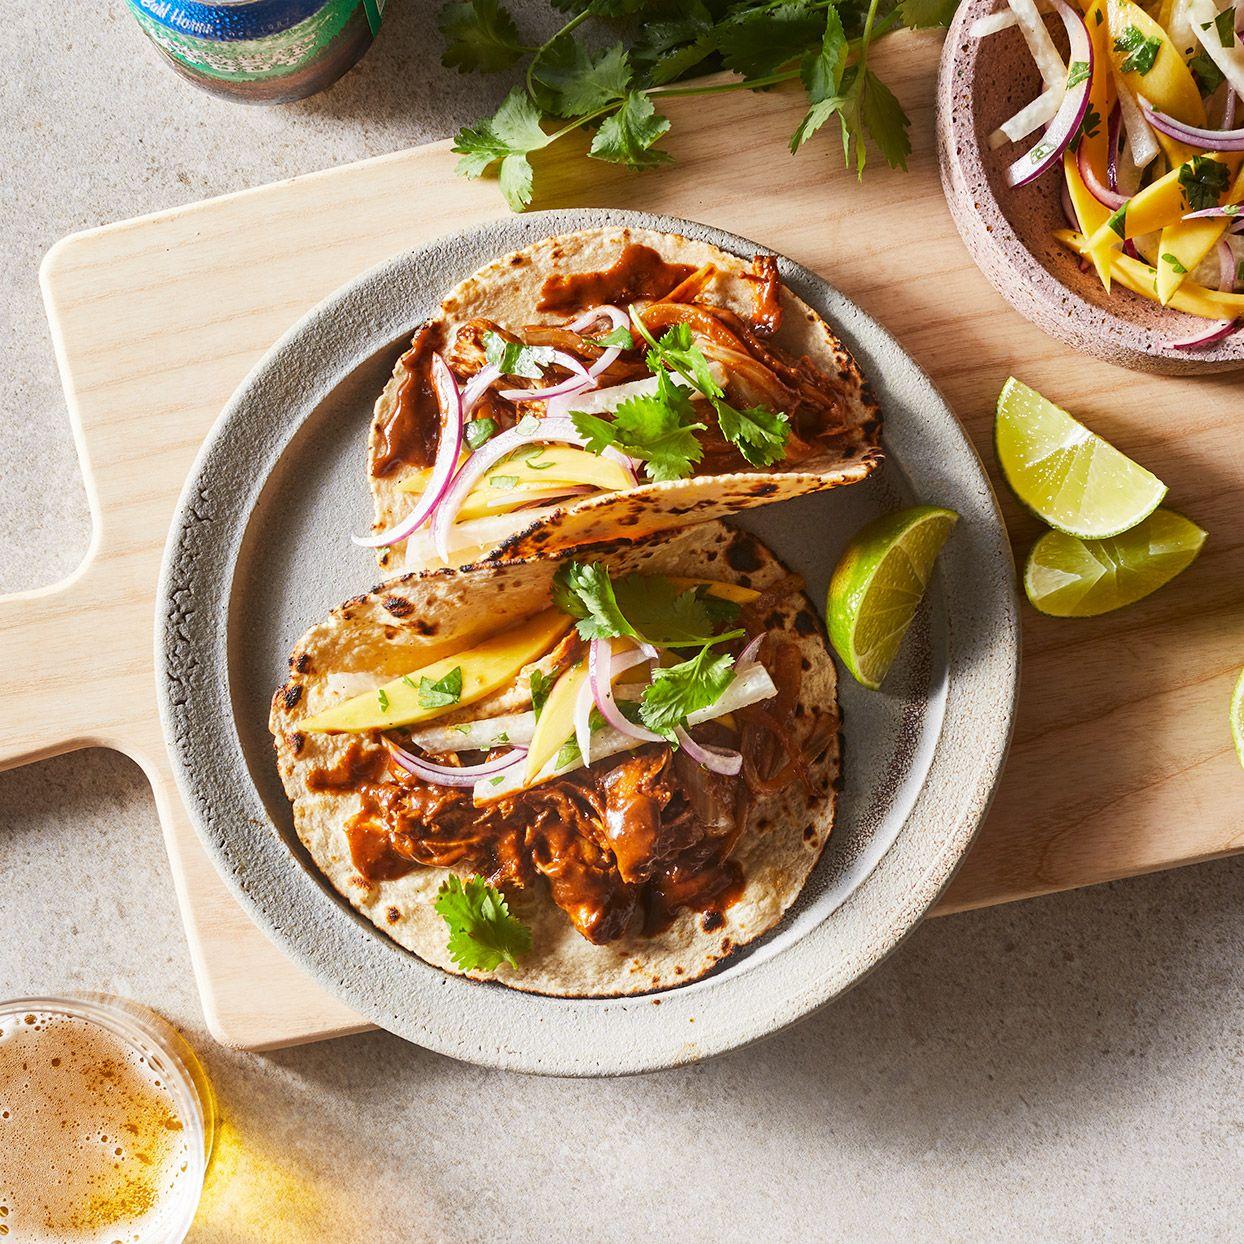 Chicken Mole Tacos With Mango Jicama Slaw Recipe Eating Well Recipes Chicken Mole Jicama Slaw